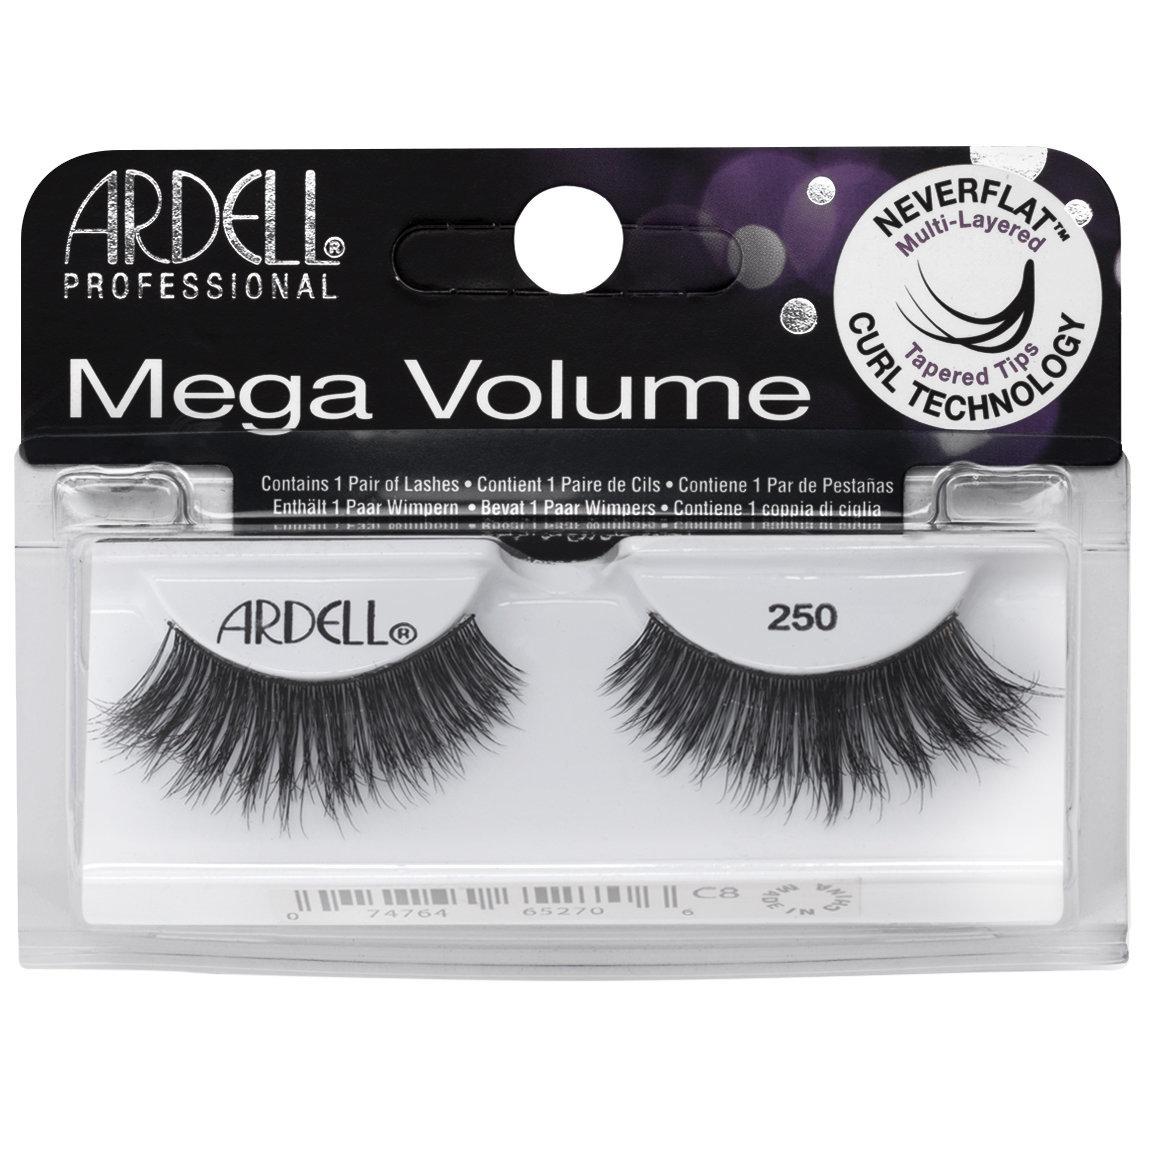 Ardell Mega Volume Lashes 250 alternative view 1.